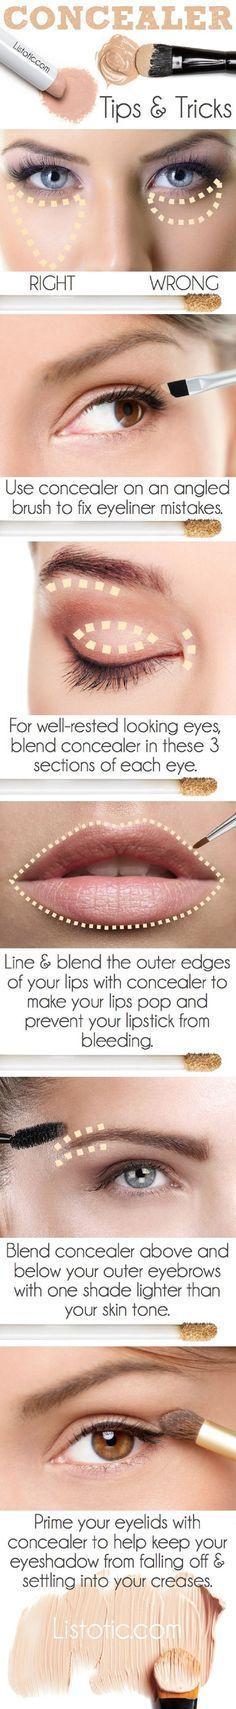 25+ best ideas about Best makeup tips on Pinterest ...